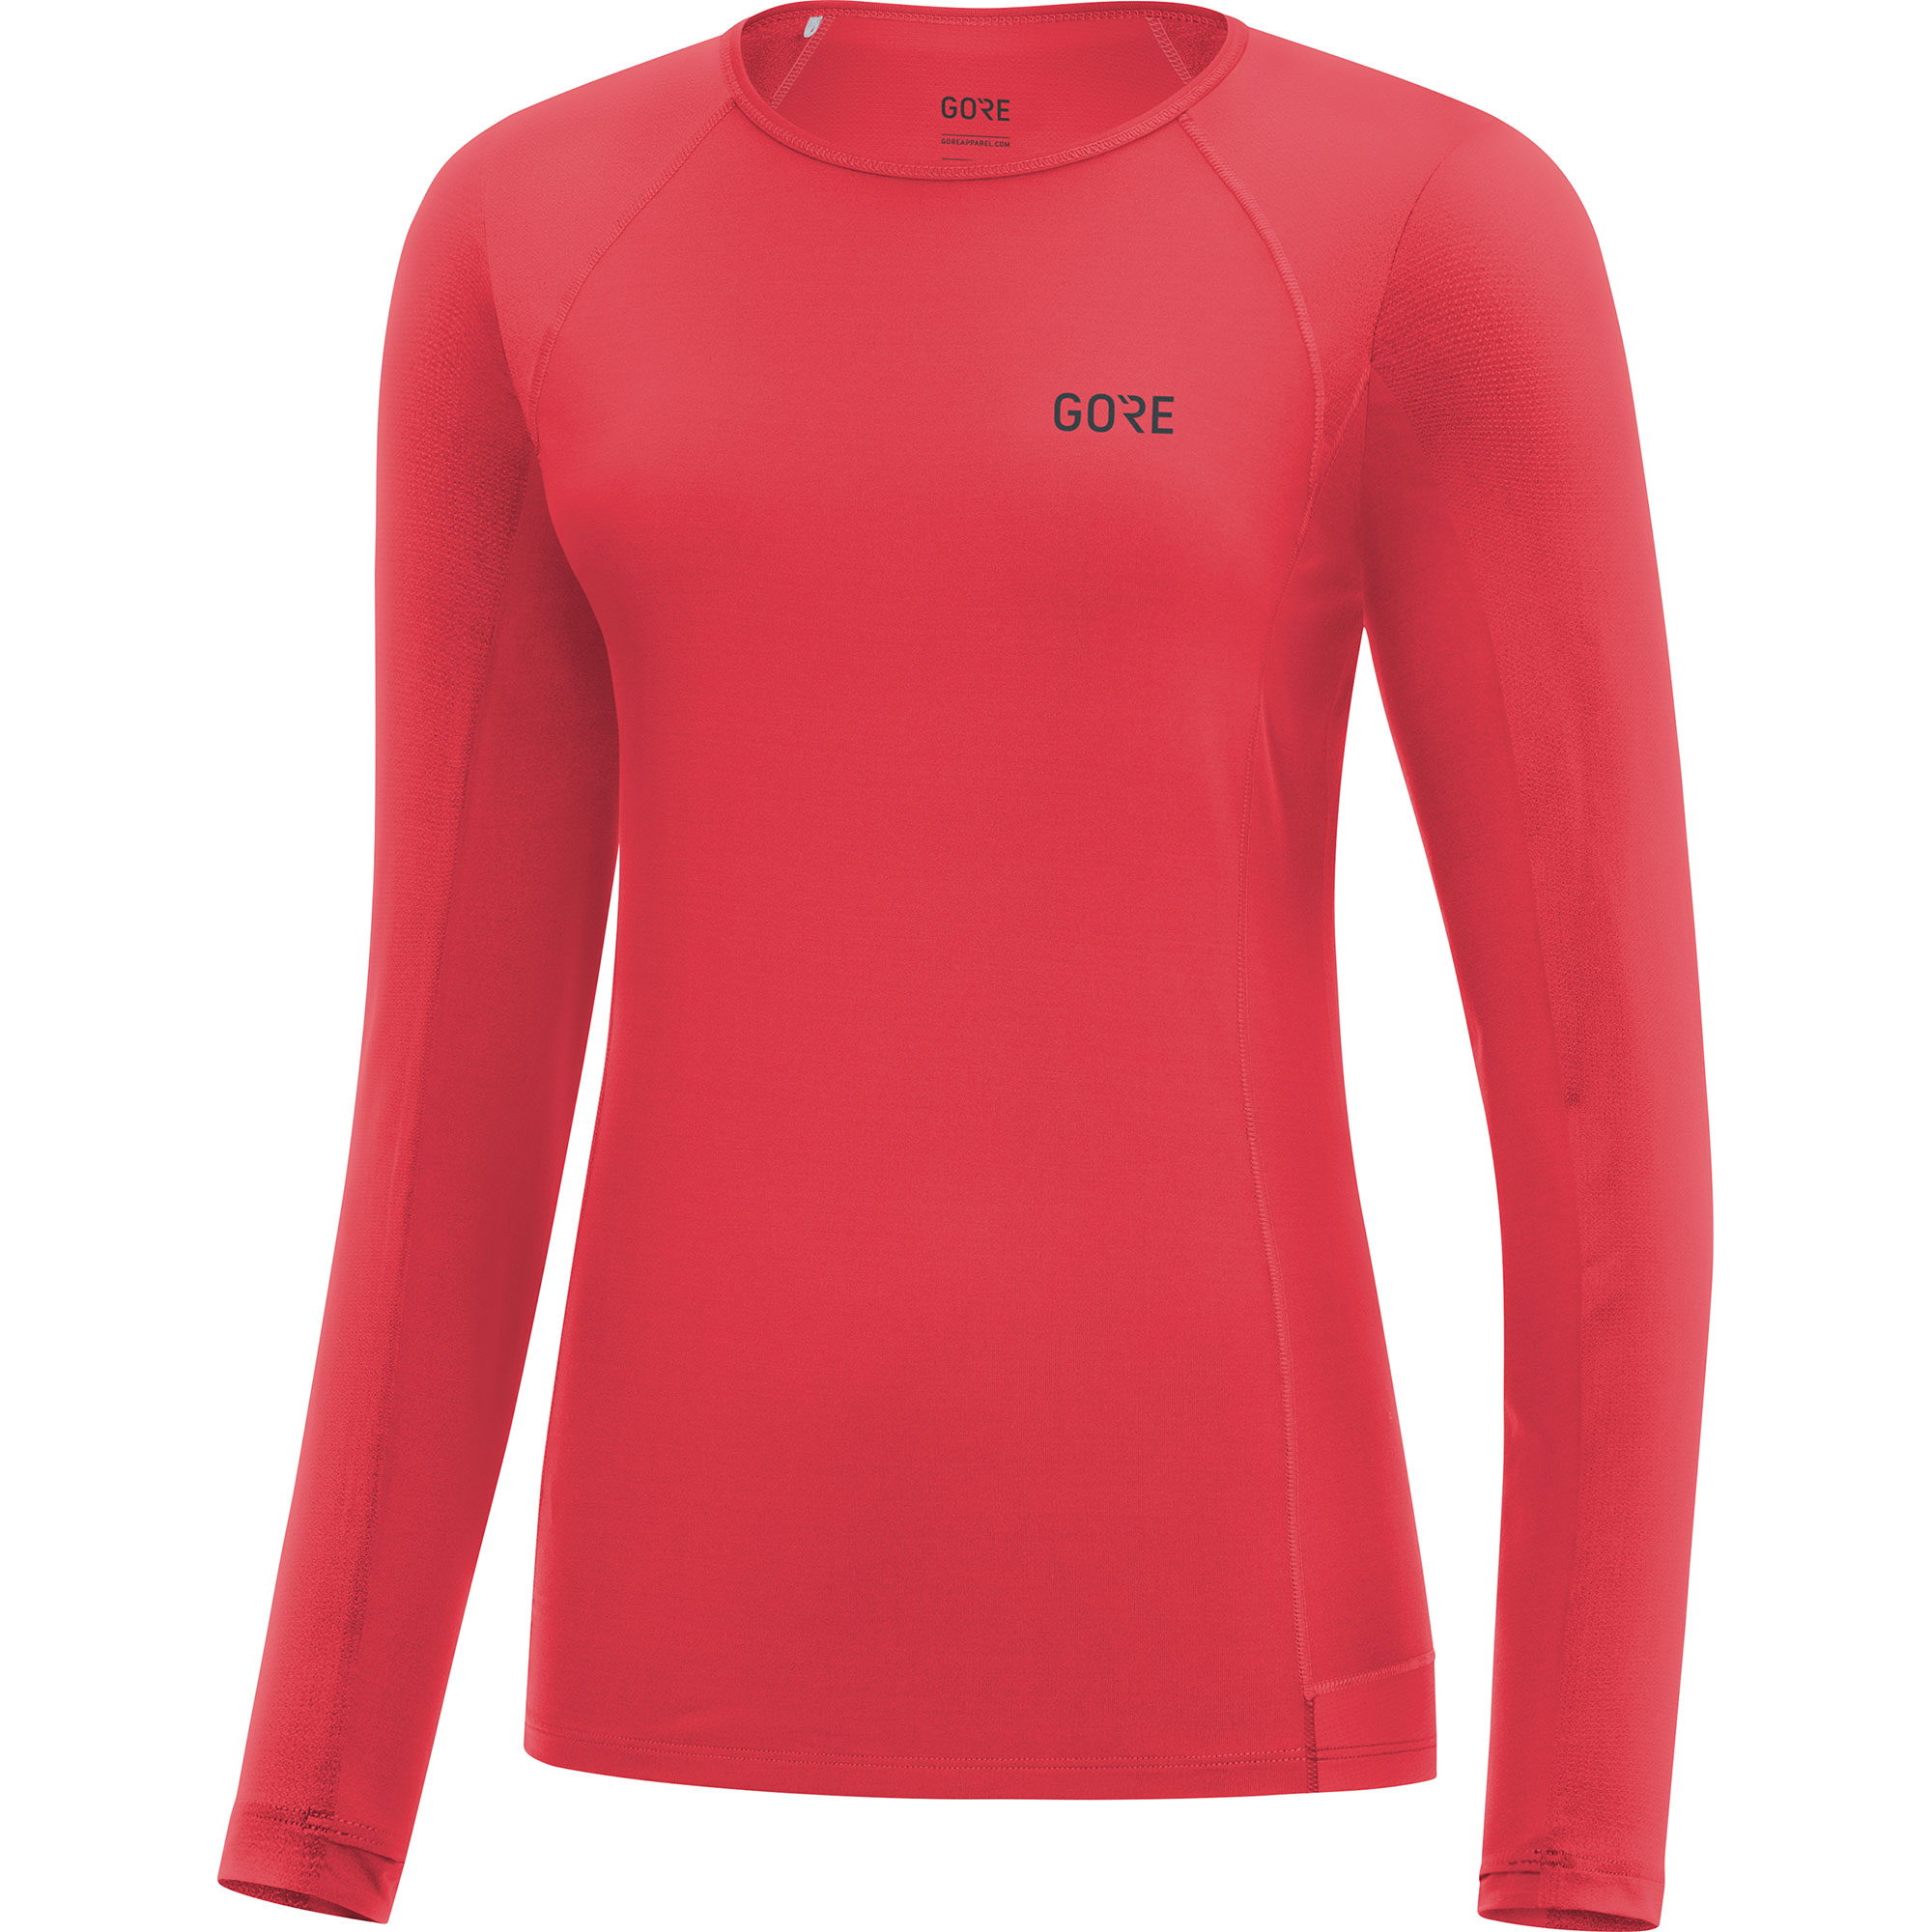 GORE R5 Women Long Sleeve Shirt